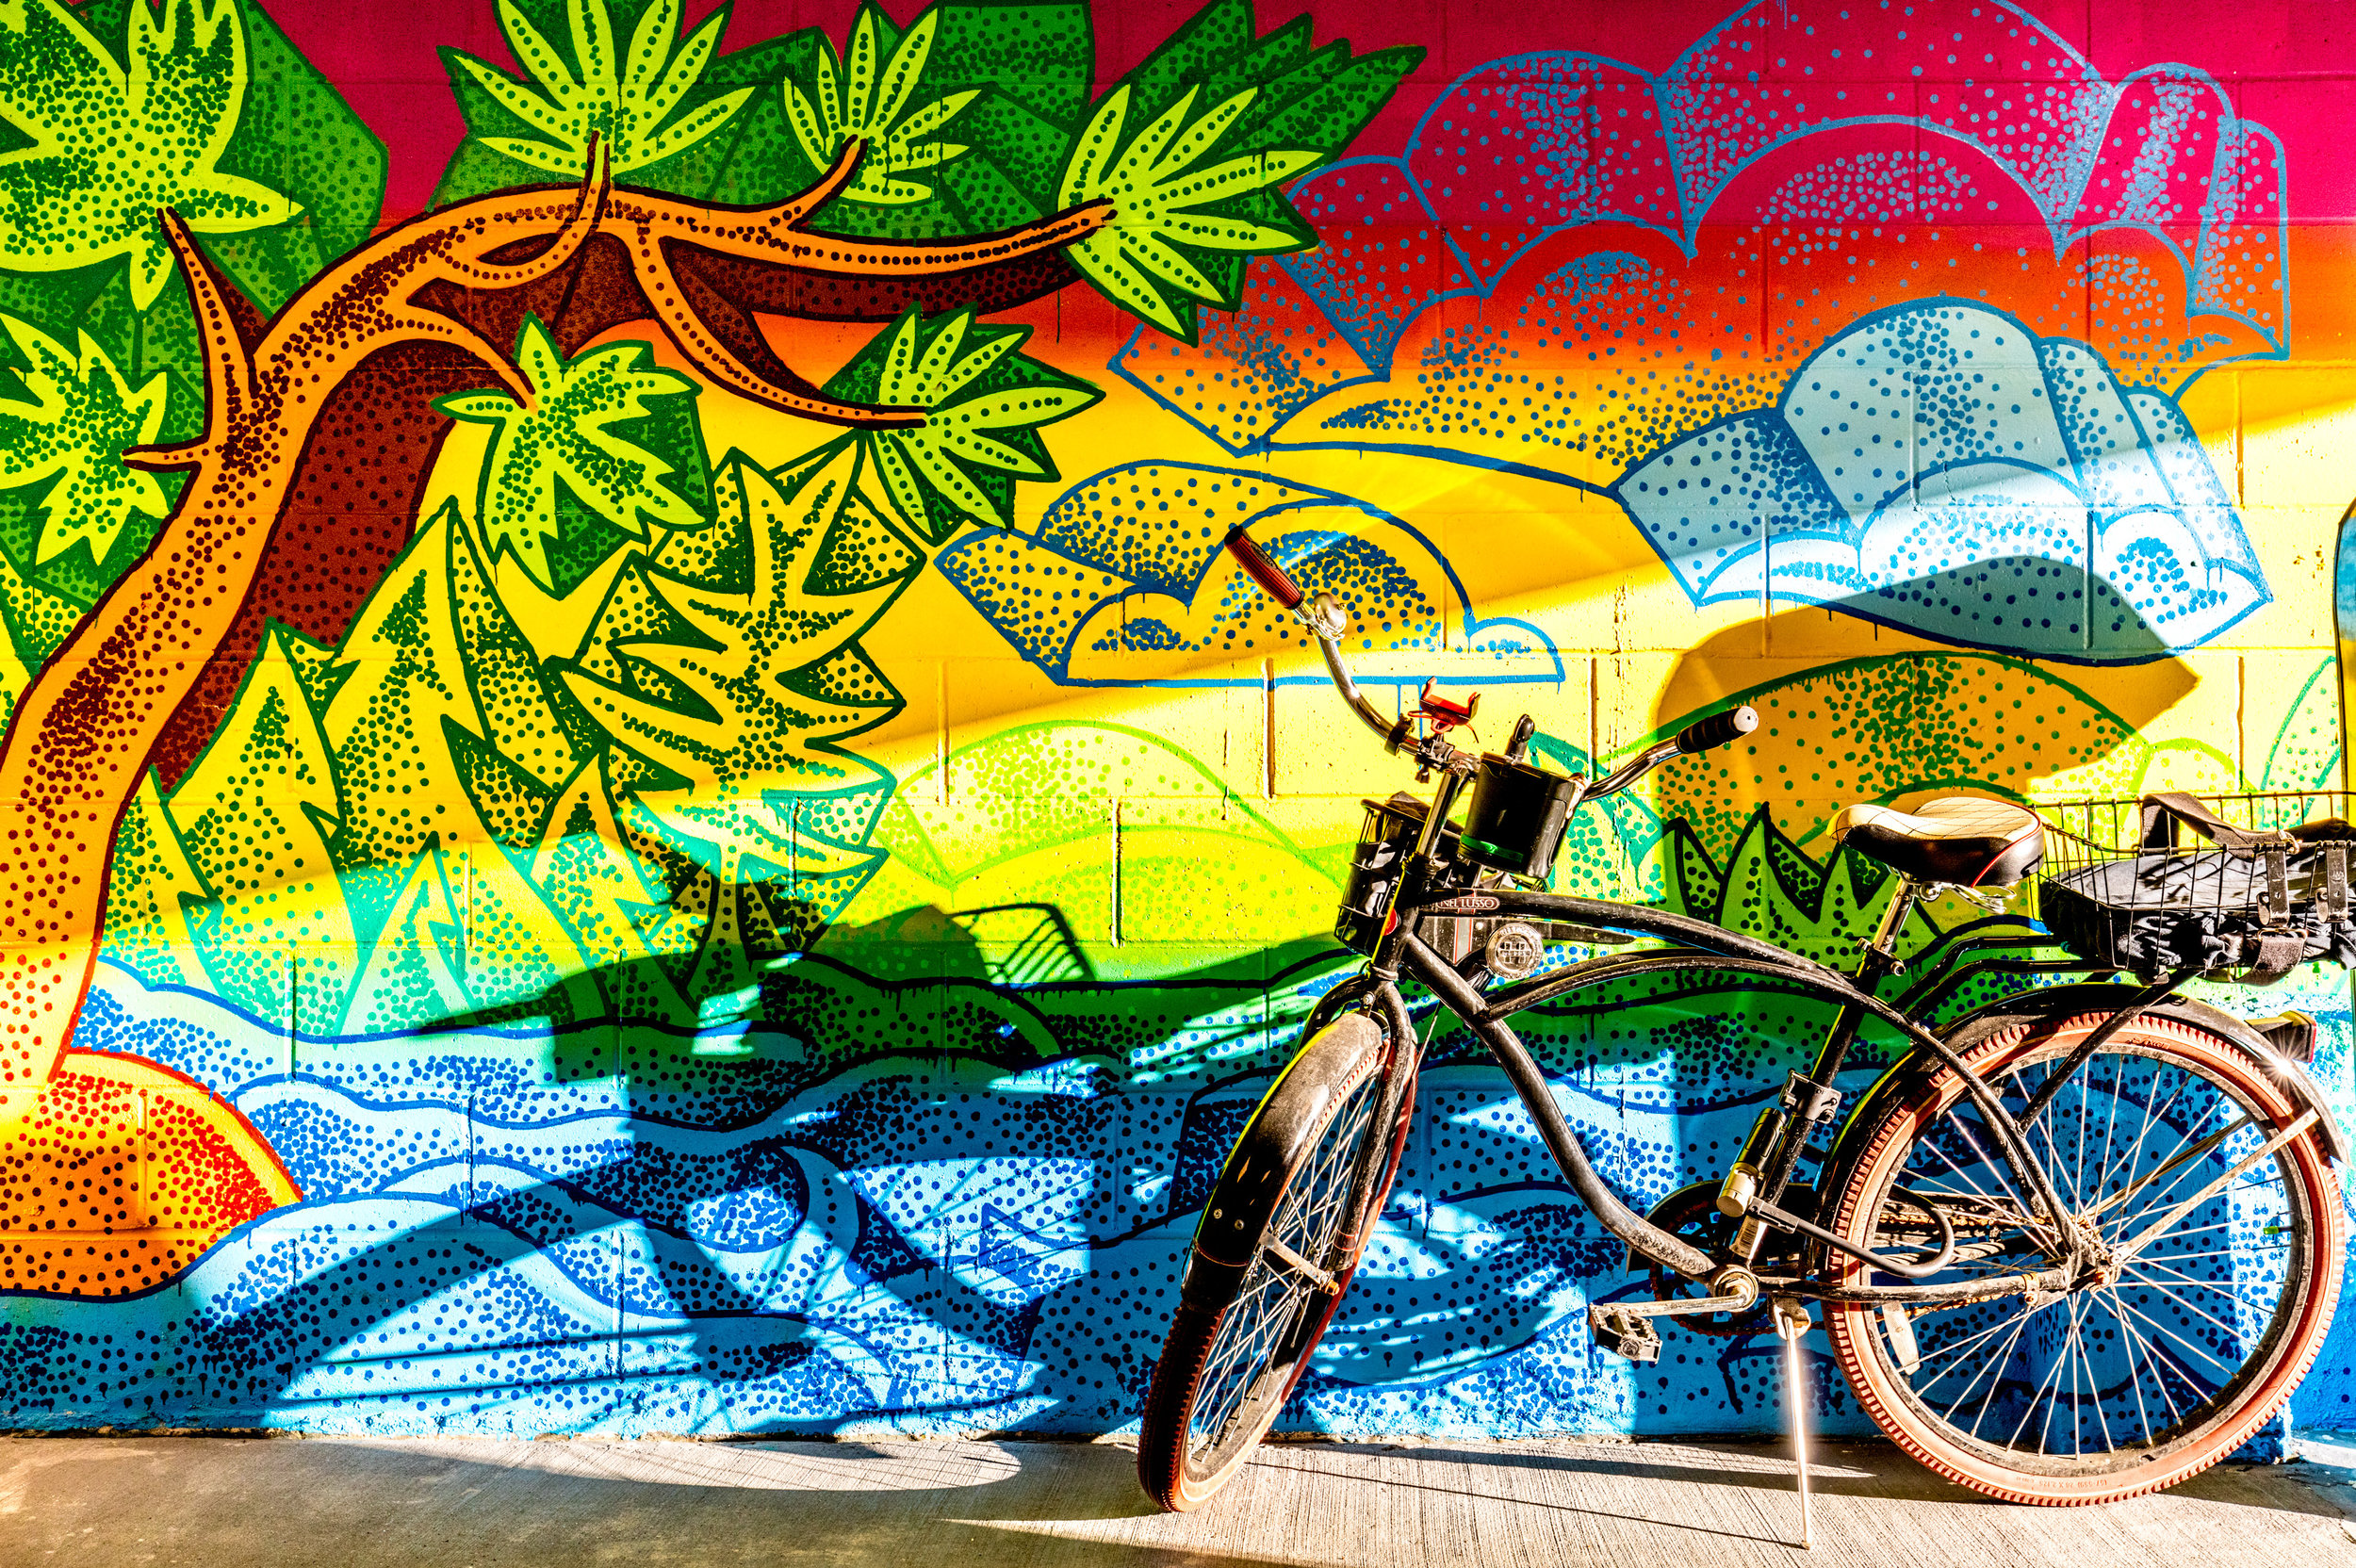 Graffiti House 8 - photo by Max Touhey.jpg